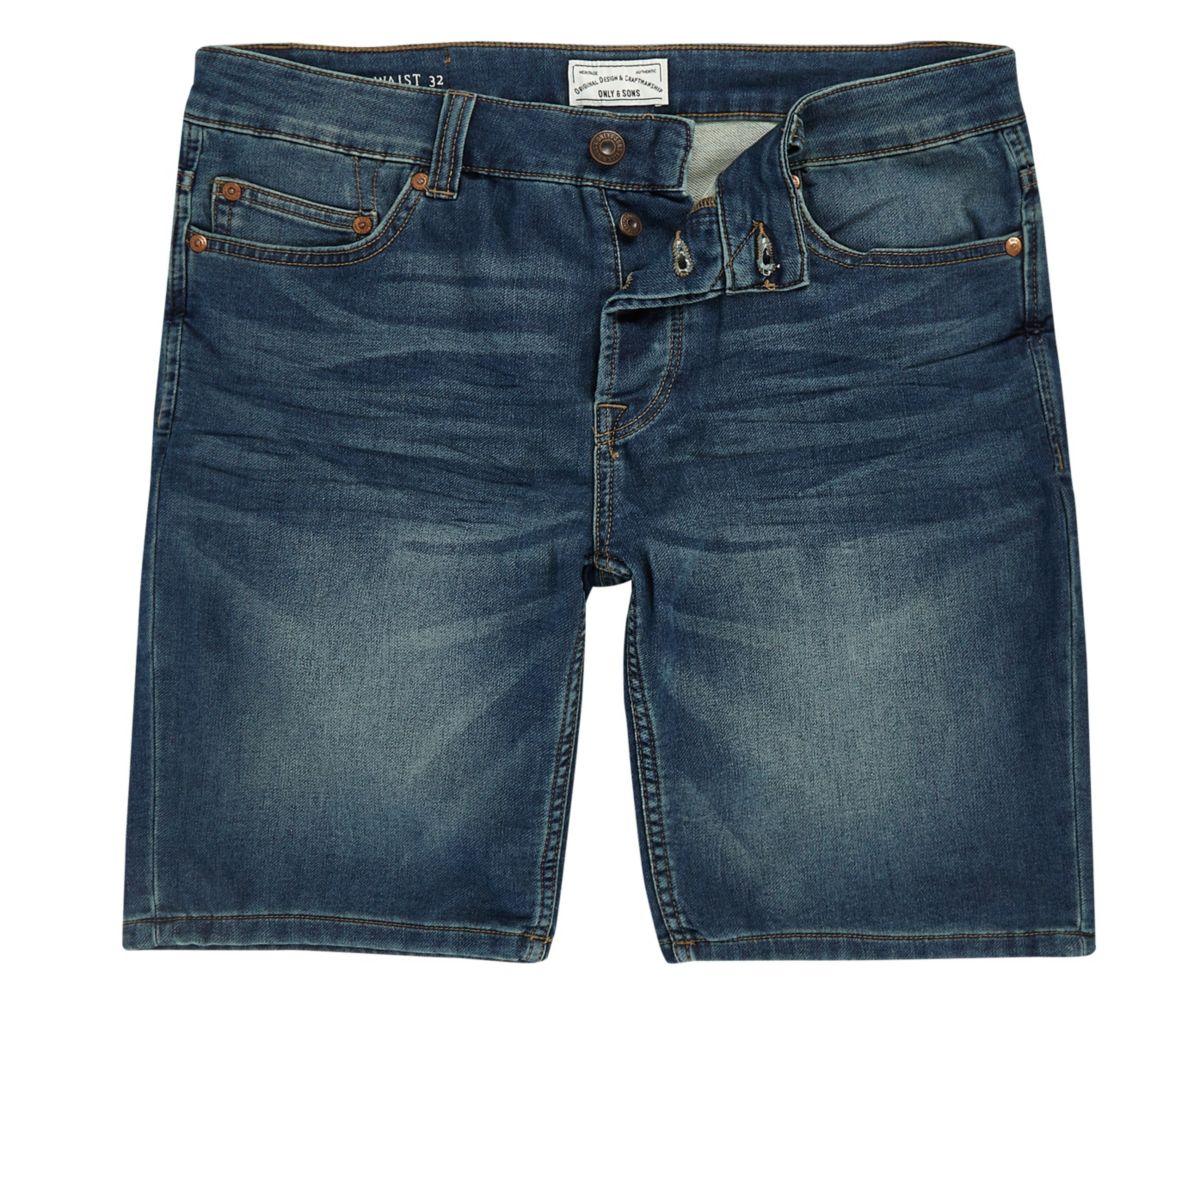 Only & Sons blue denim shorts